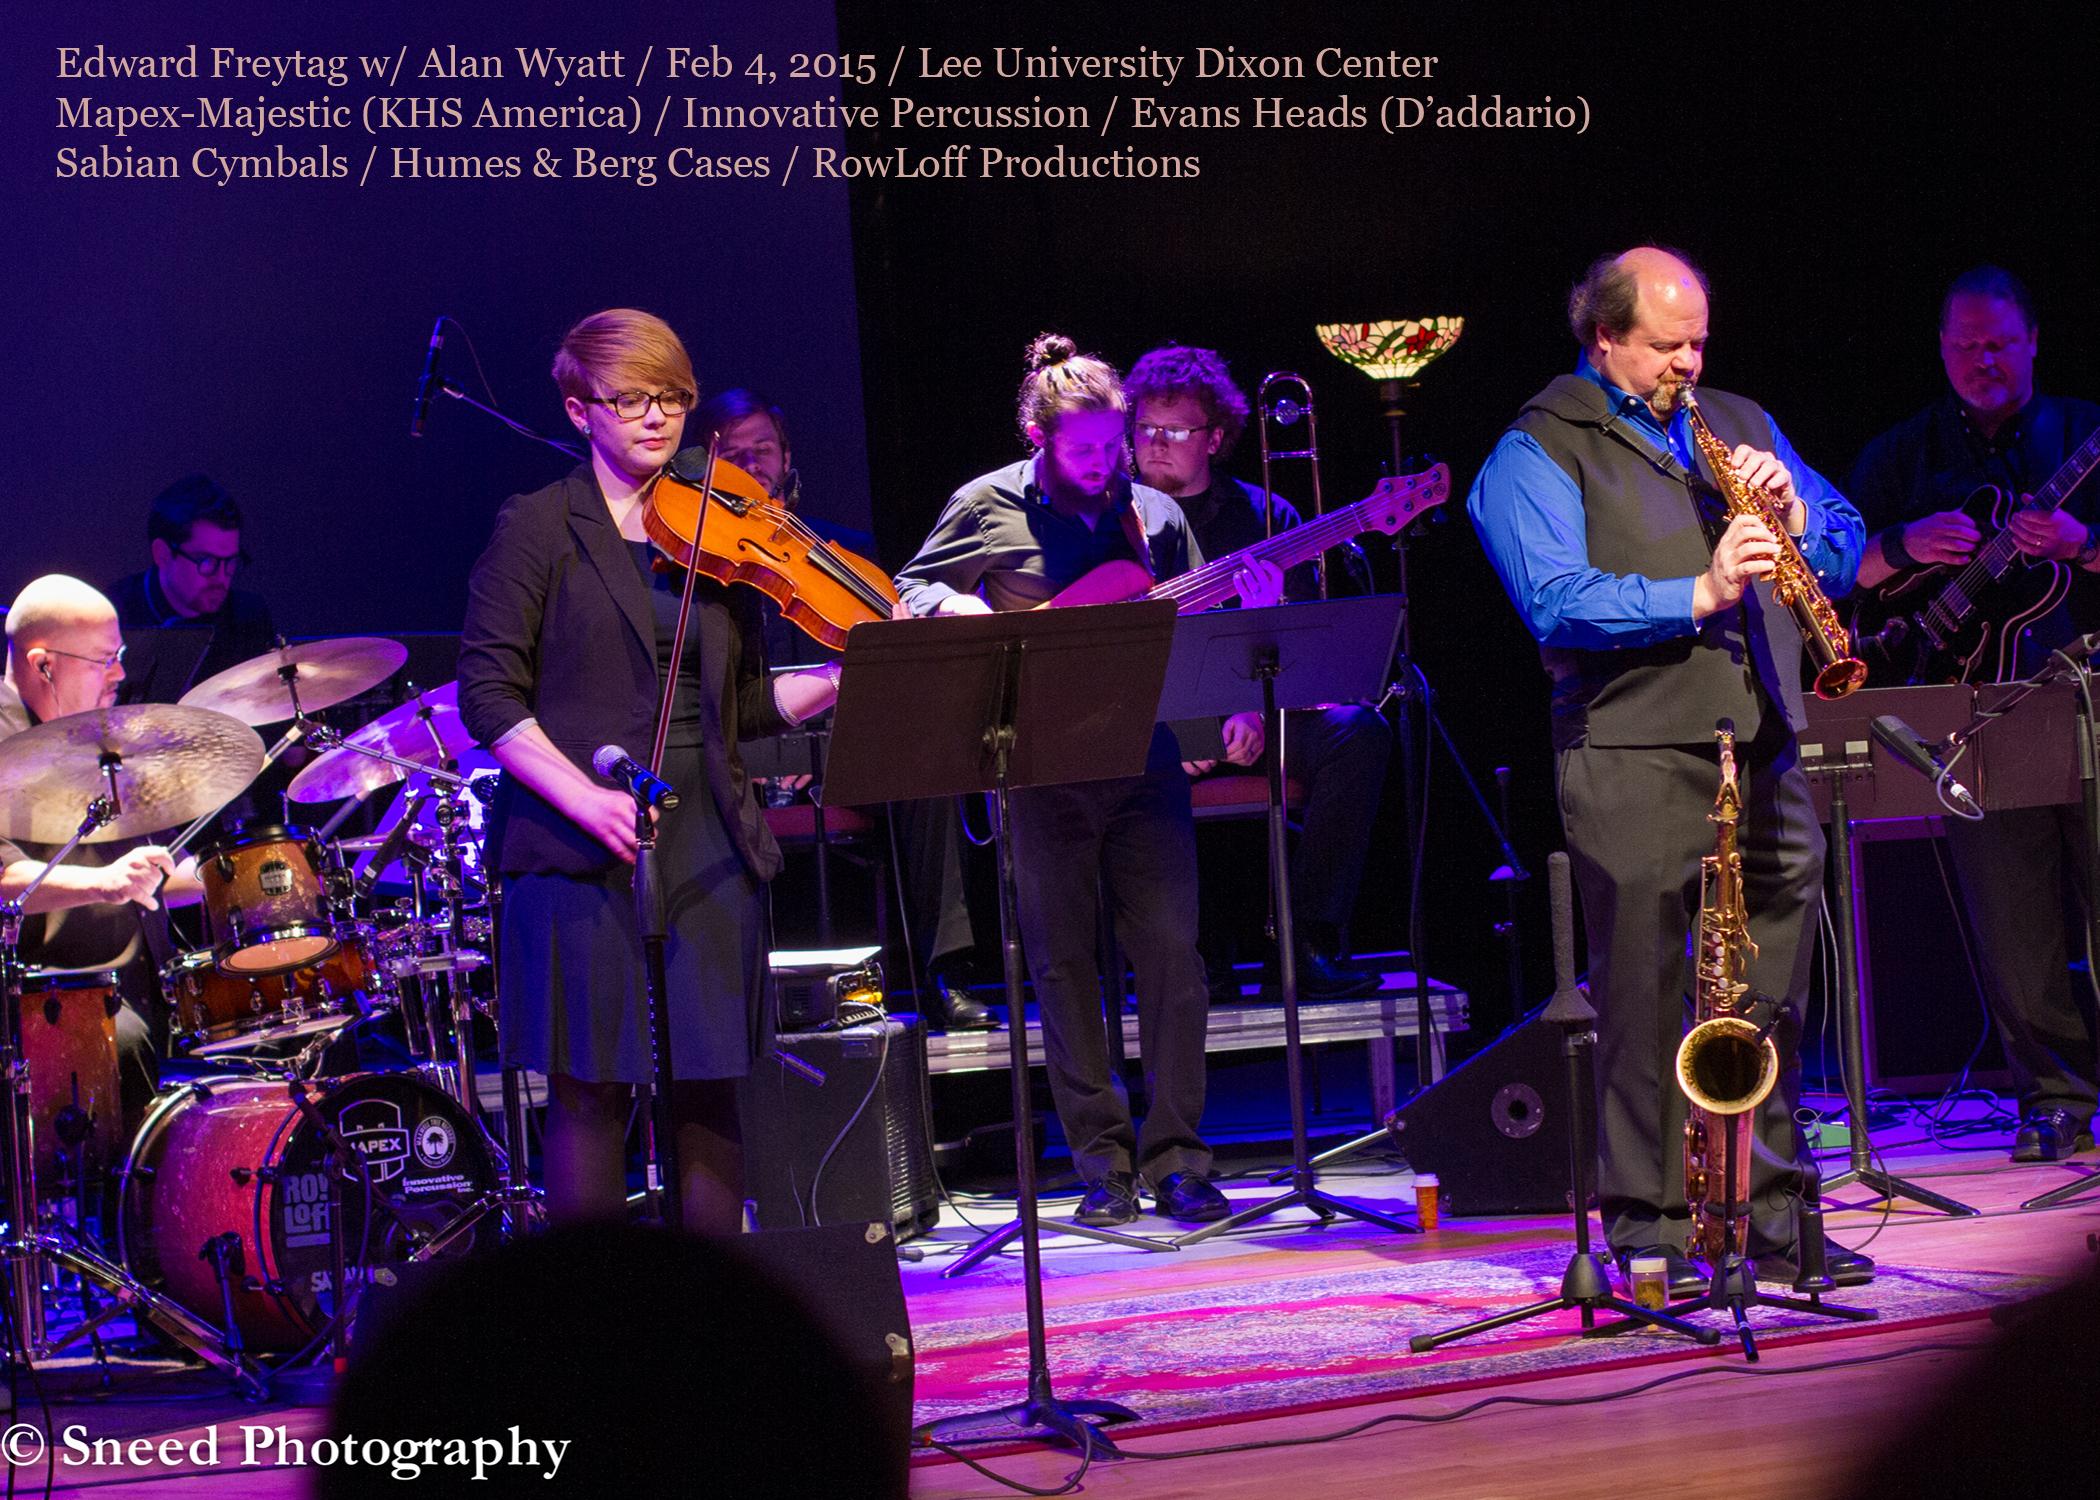 Playing on Alan Wyatt's jazz performance at Lee University, 2015